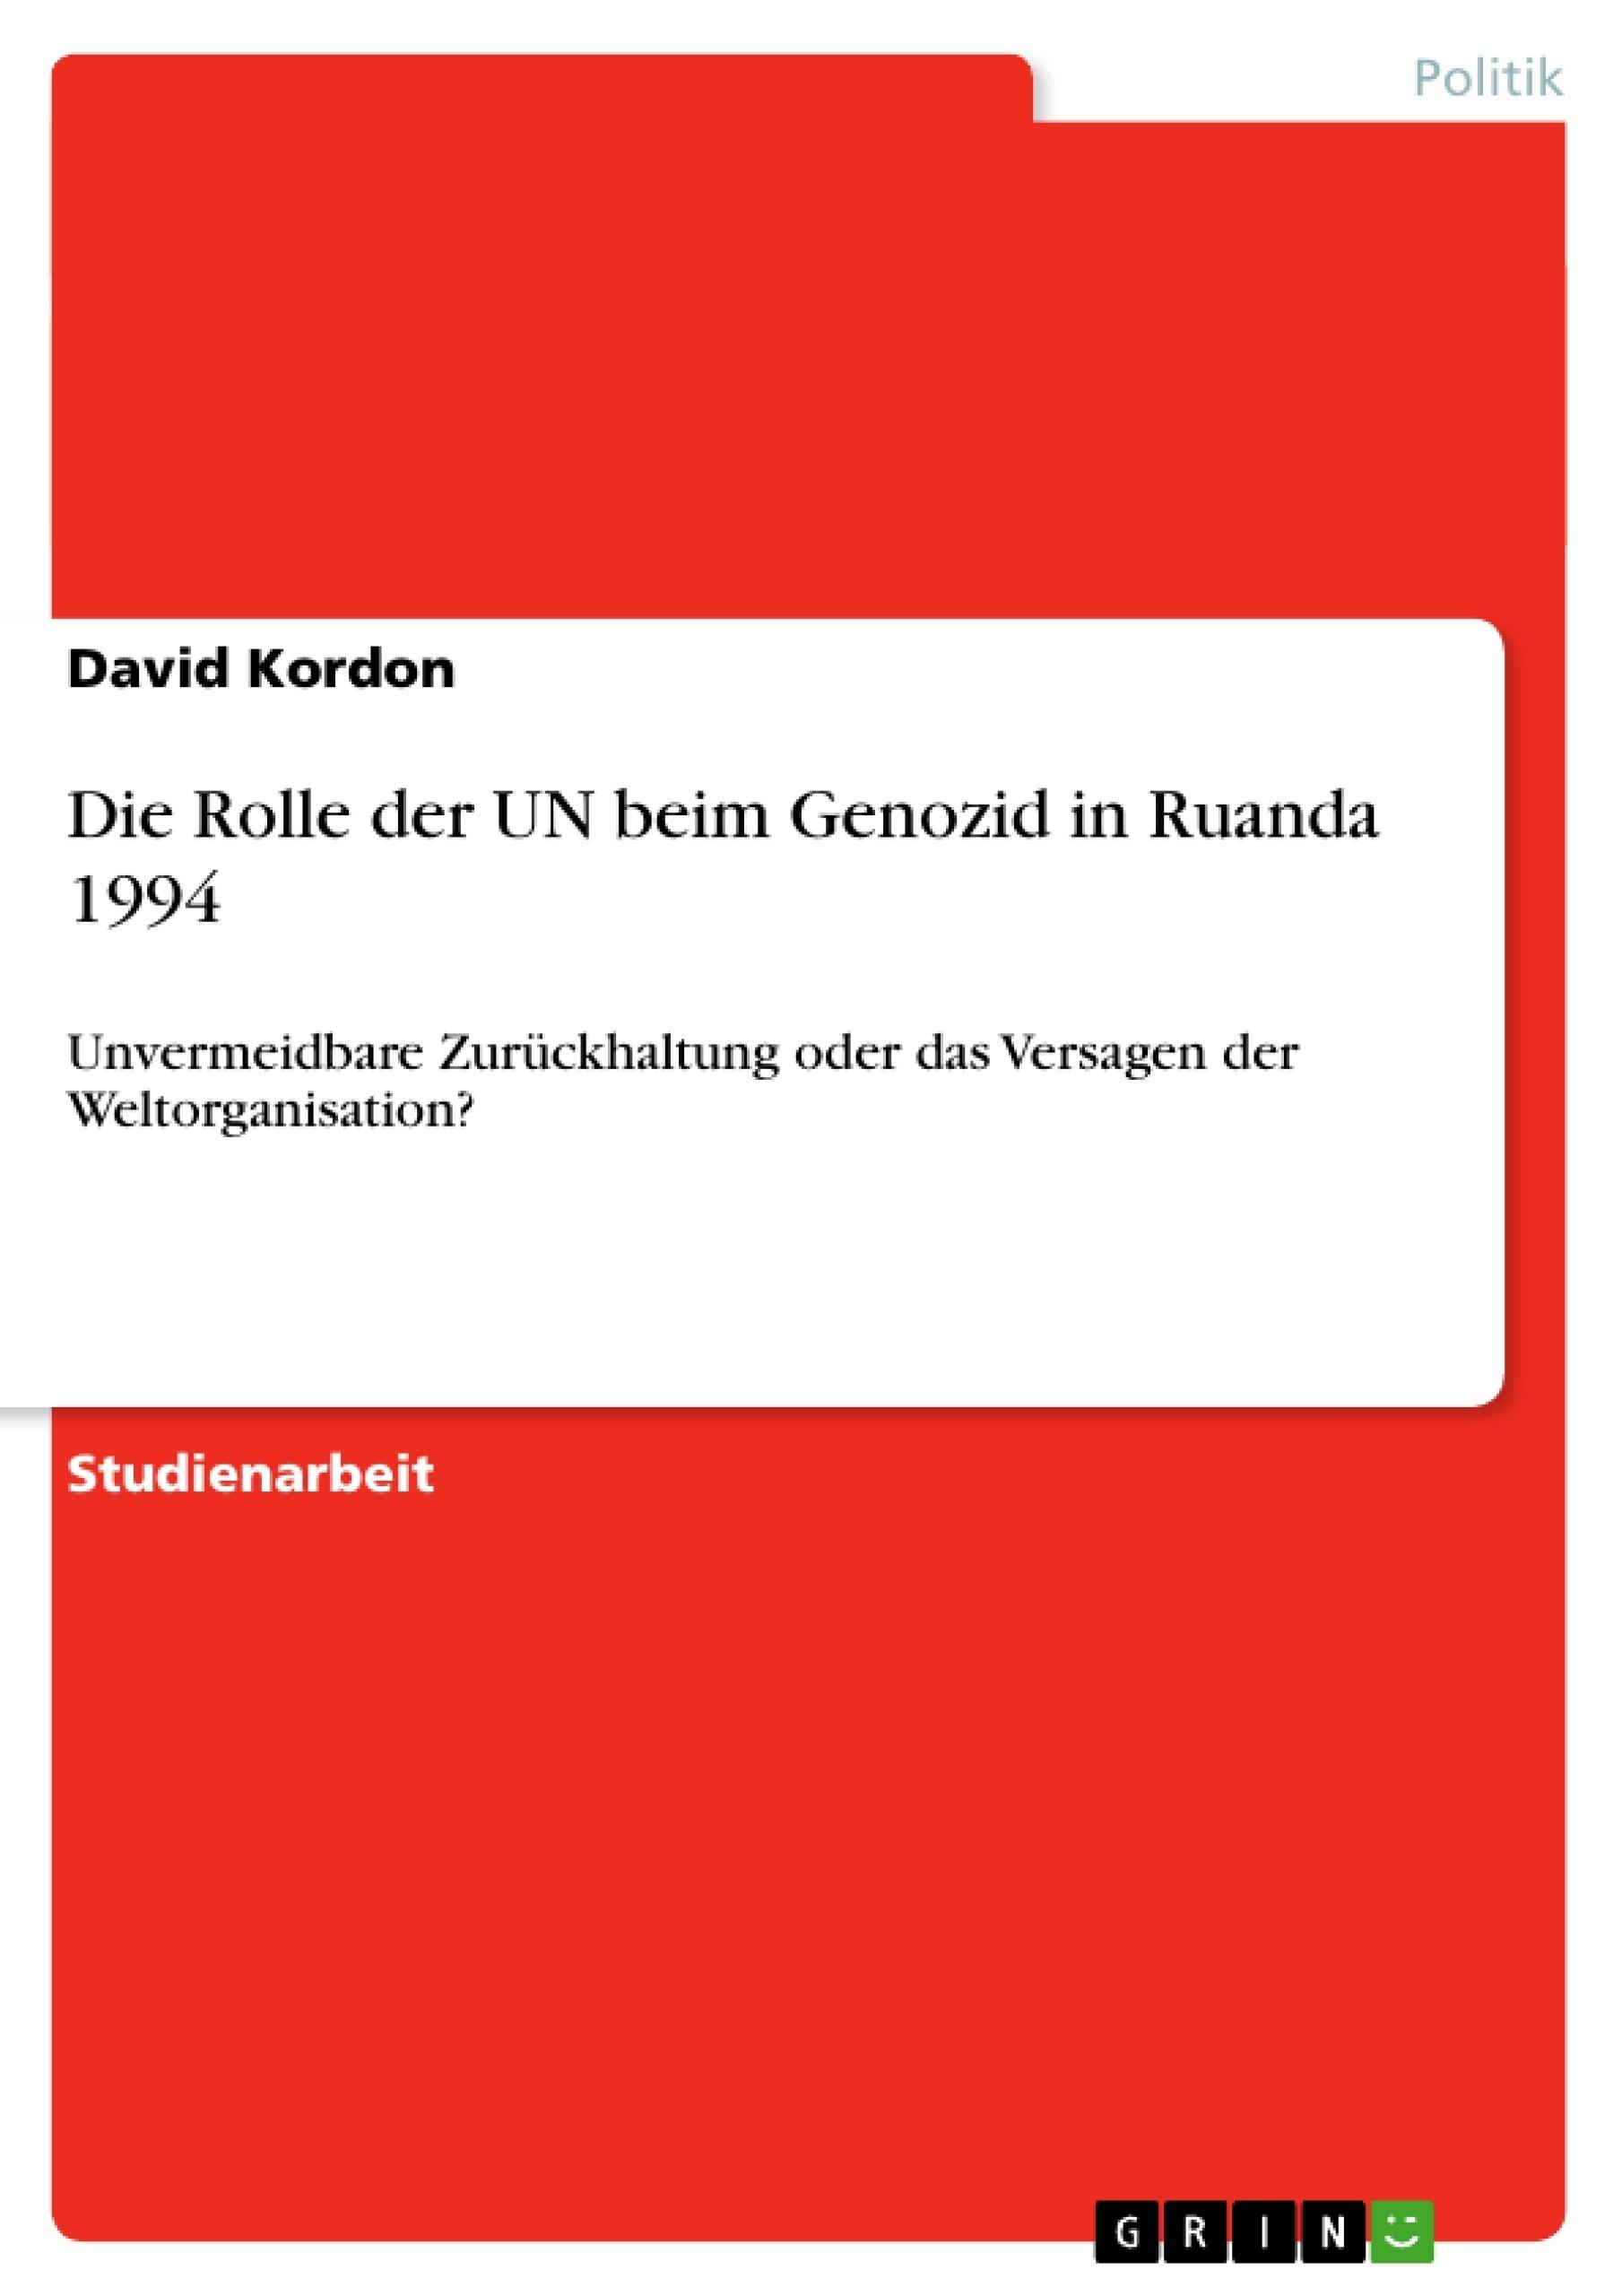 Titel: Die Rolle der UN beim Genozid in Ruanda 1994